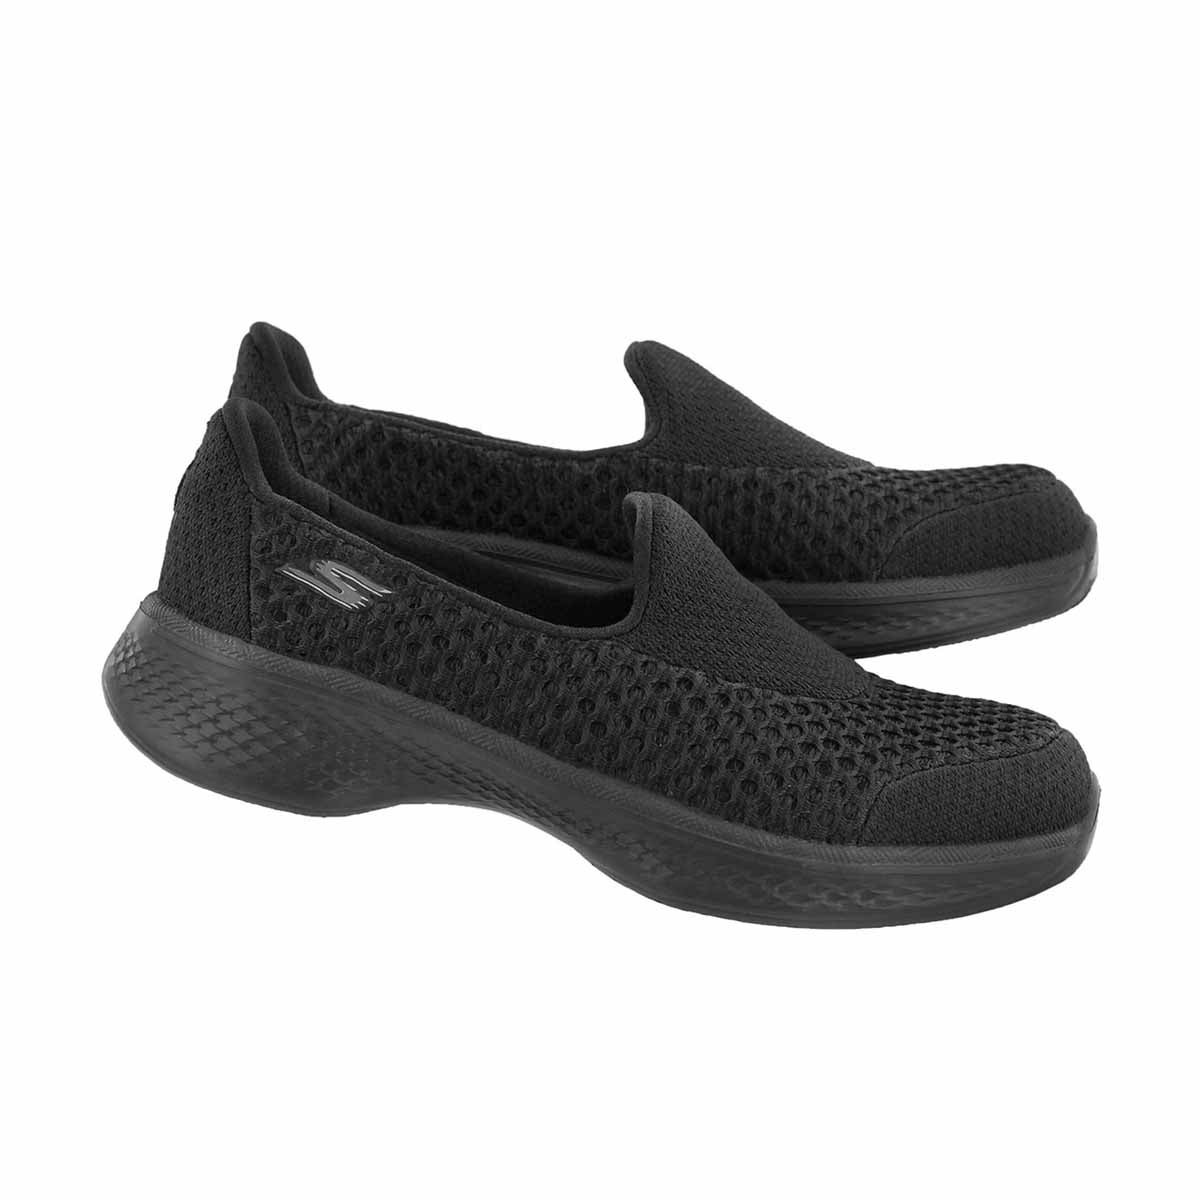 Grls GOWalk4 Kindle black slip on shoe